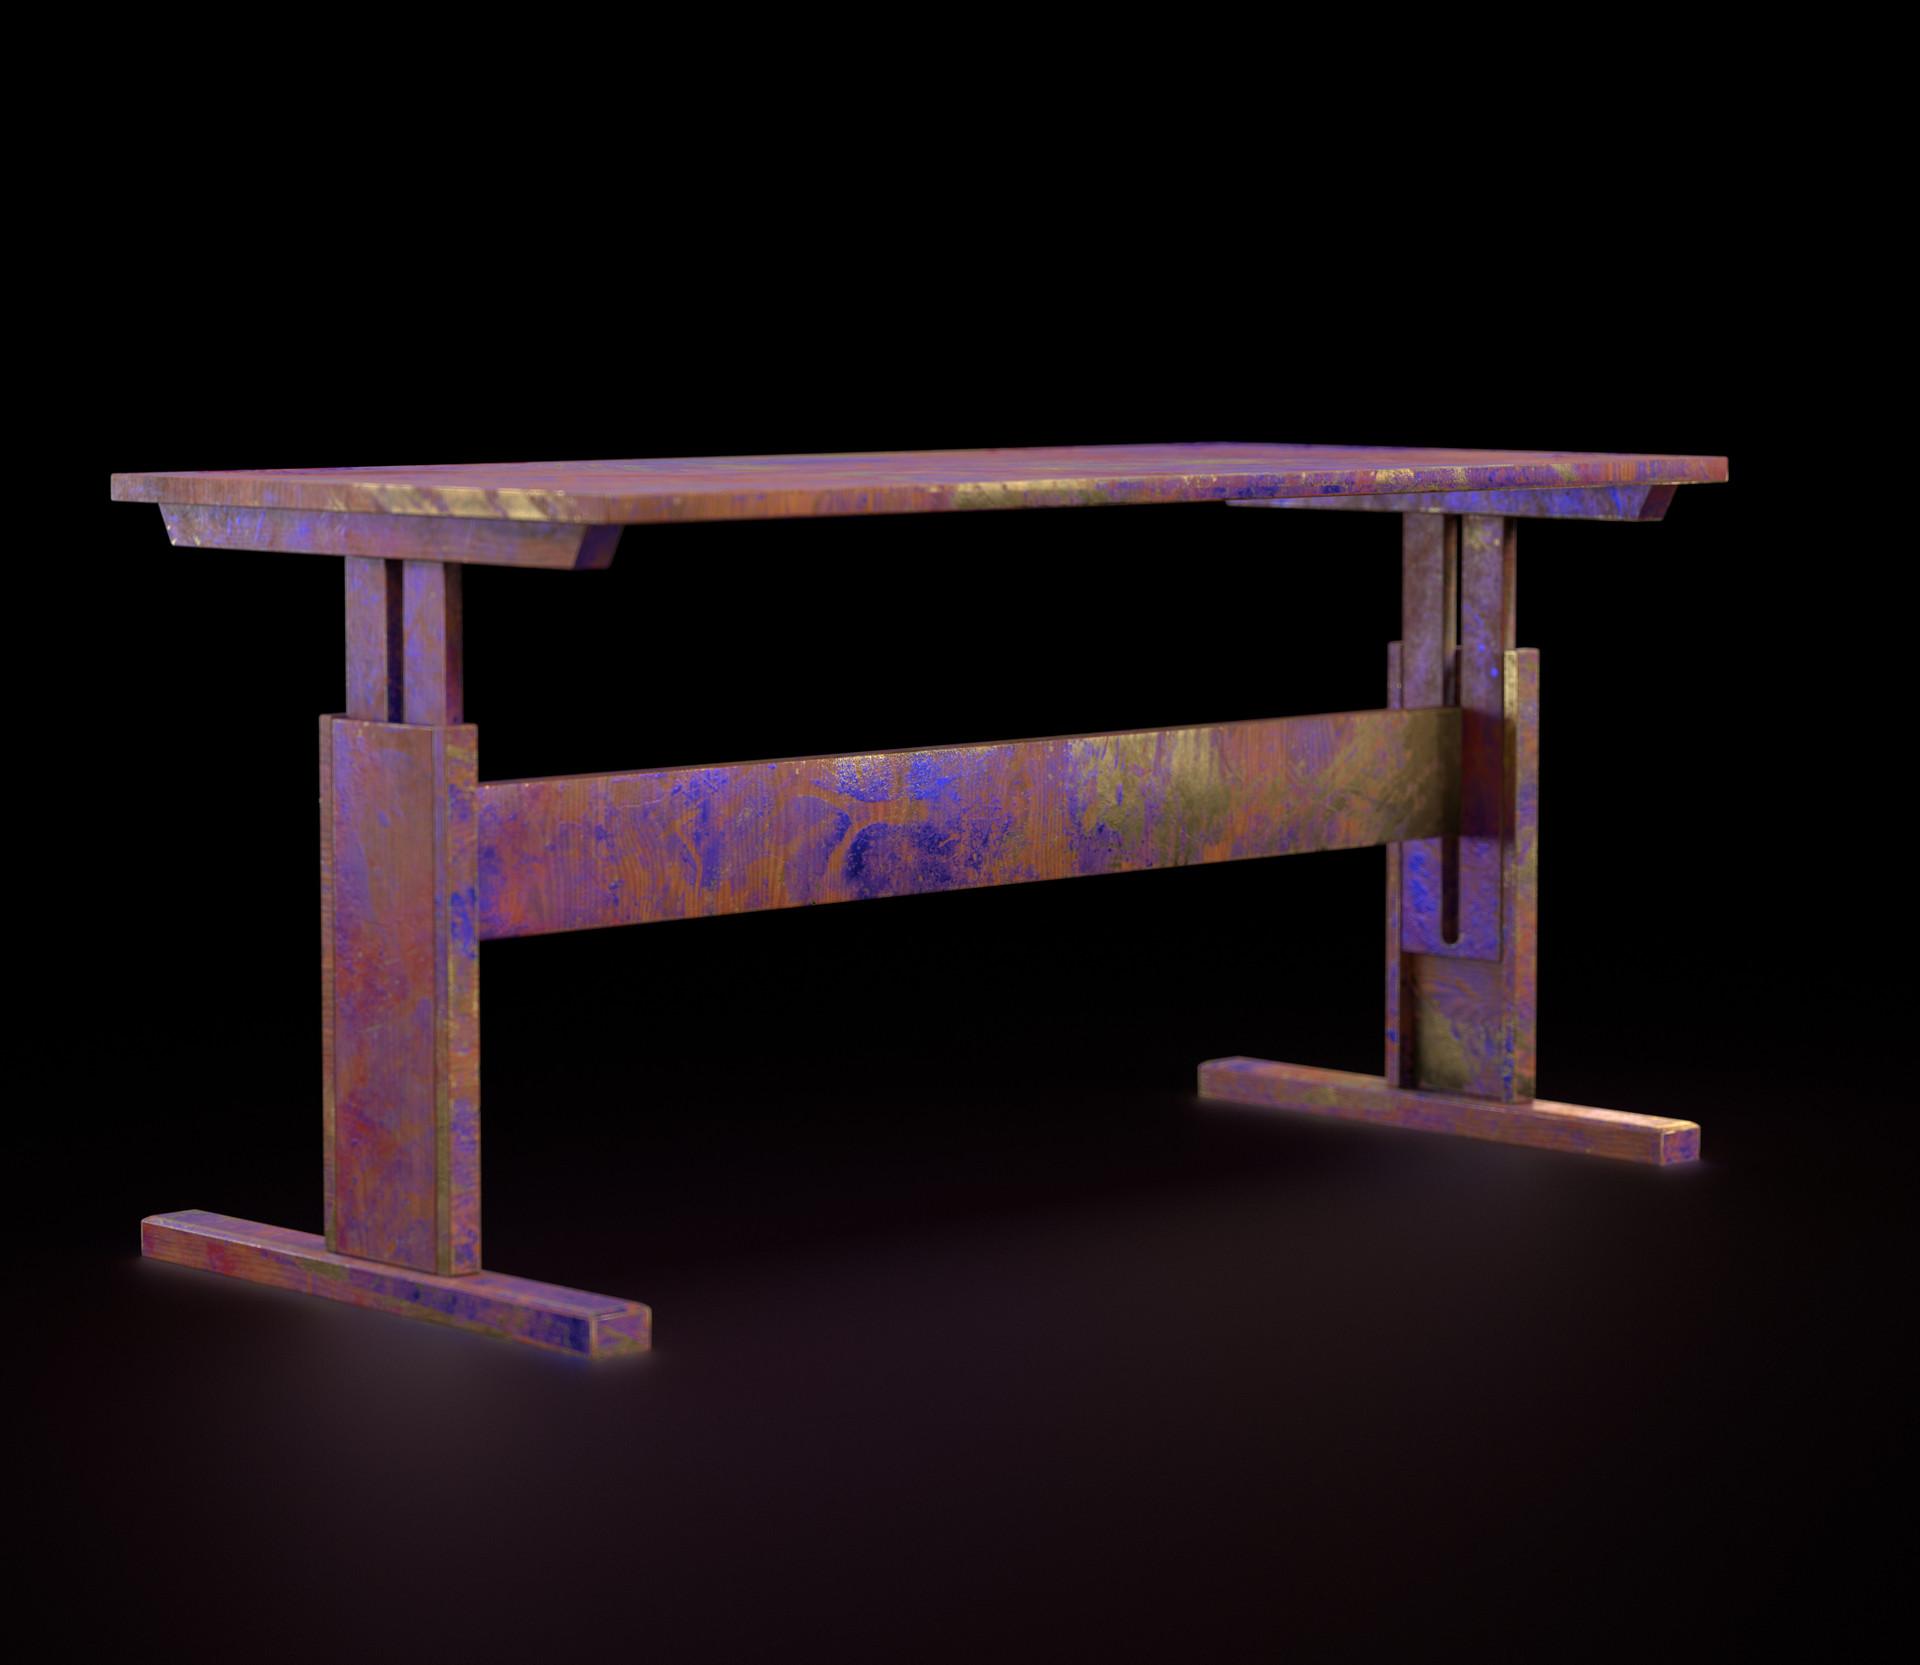 Dawid cencora skins desk